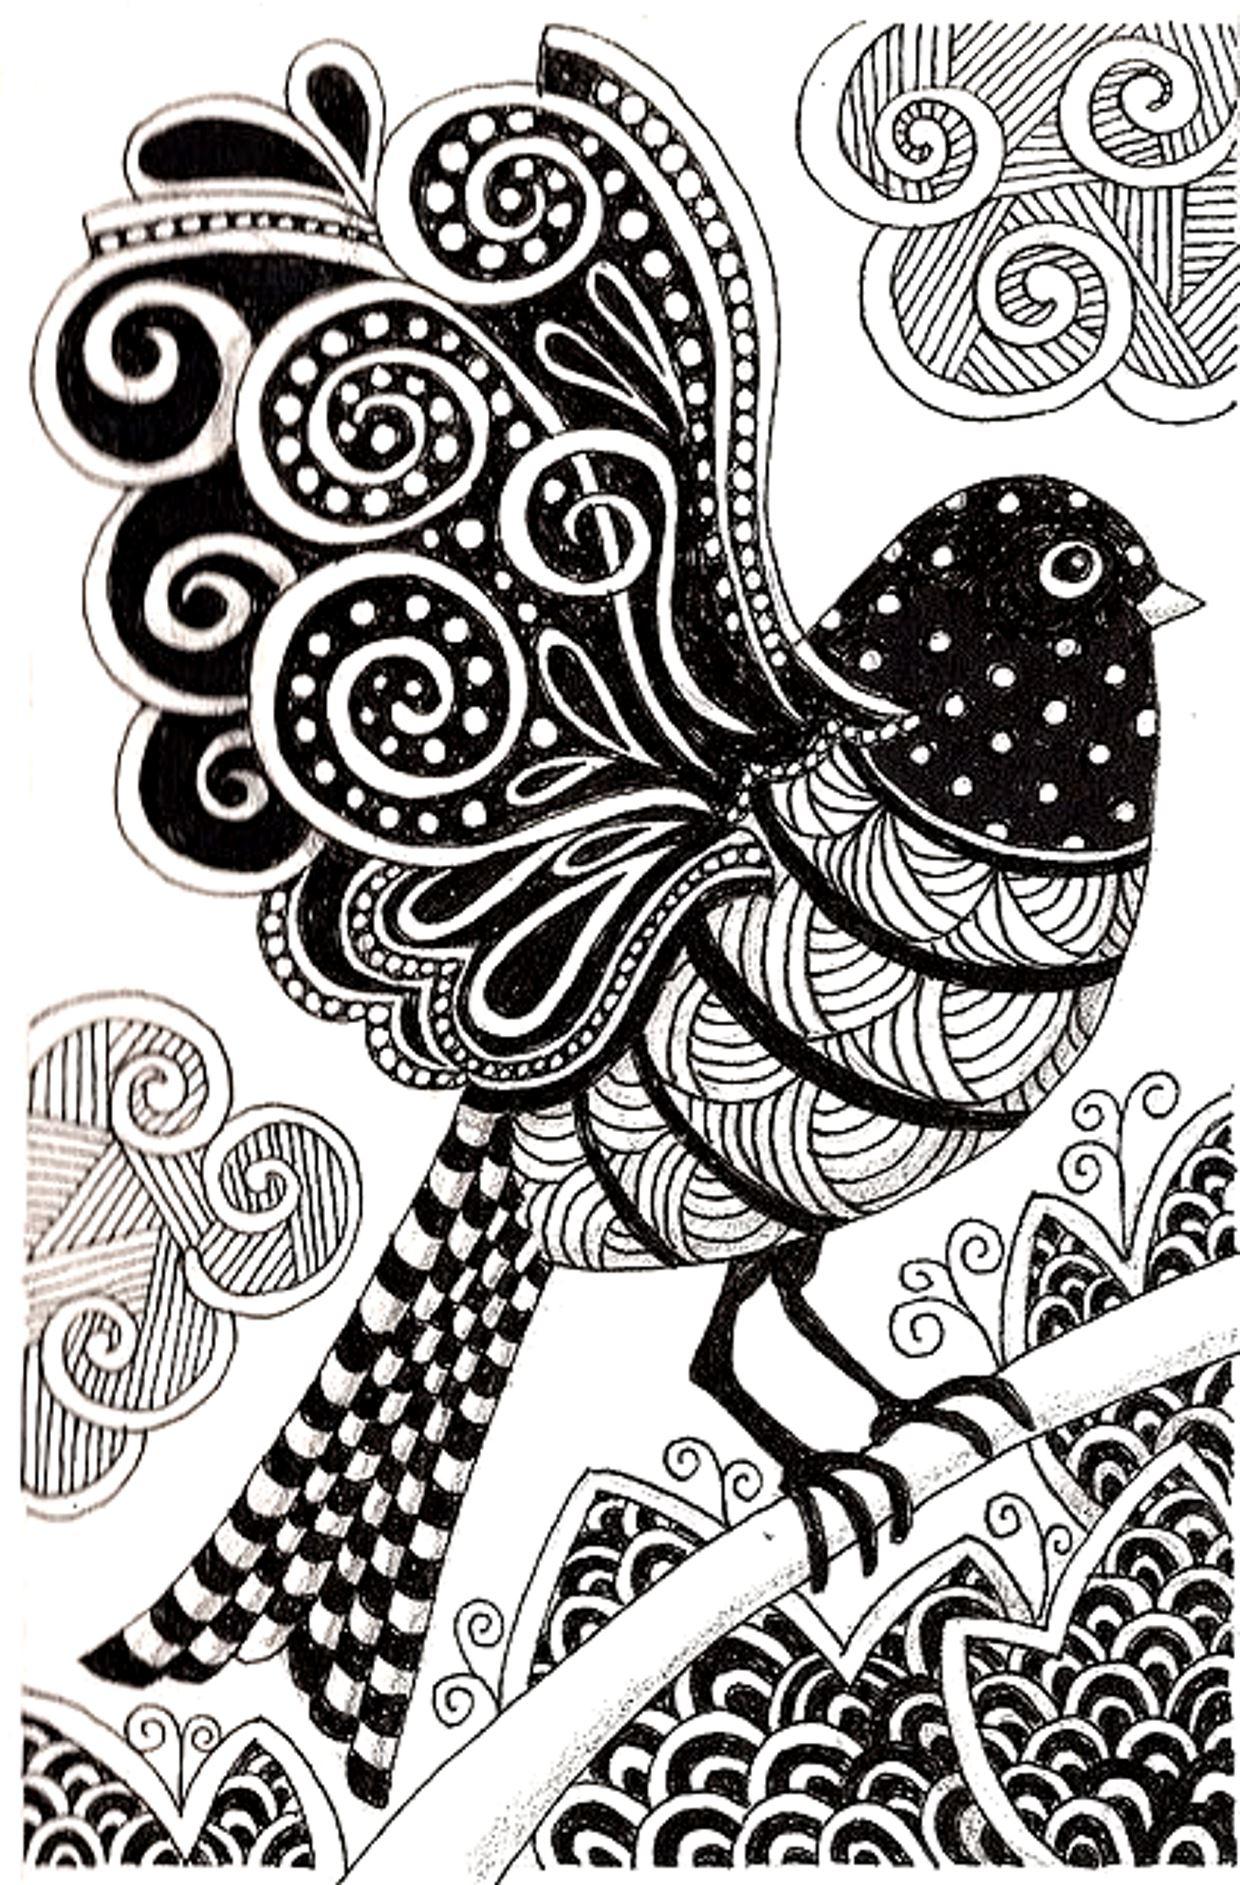 Oiseau sombre